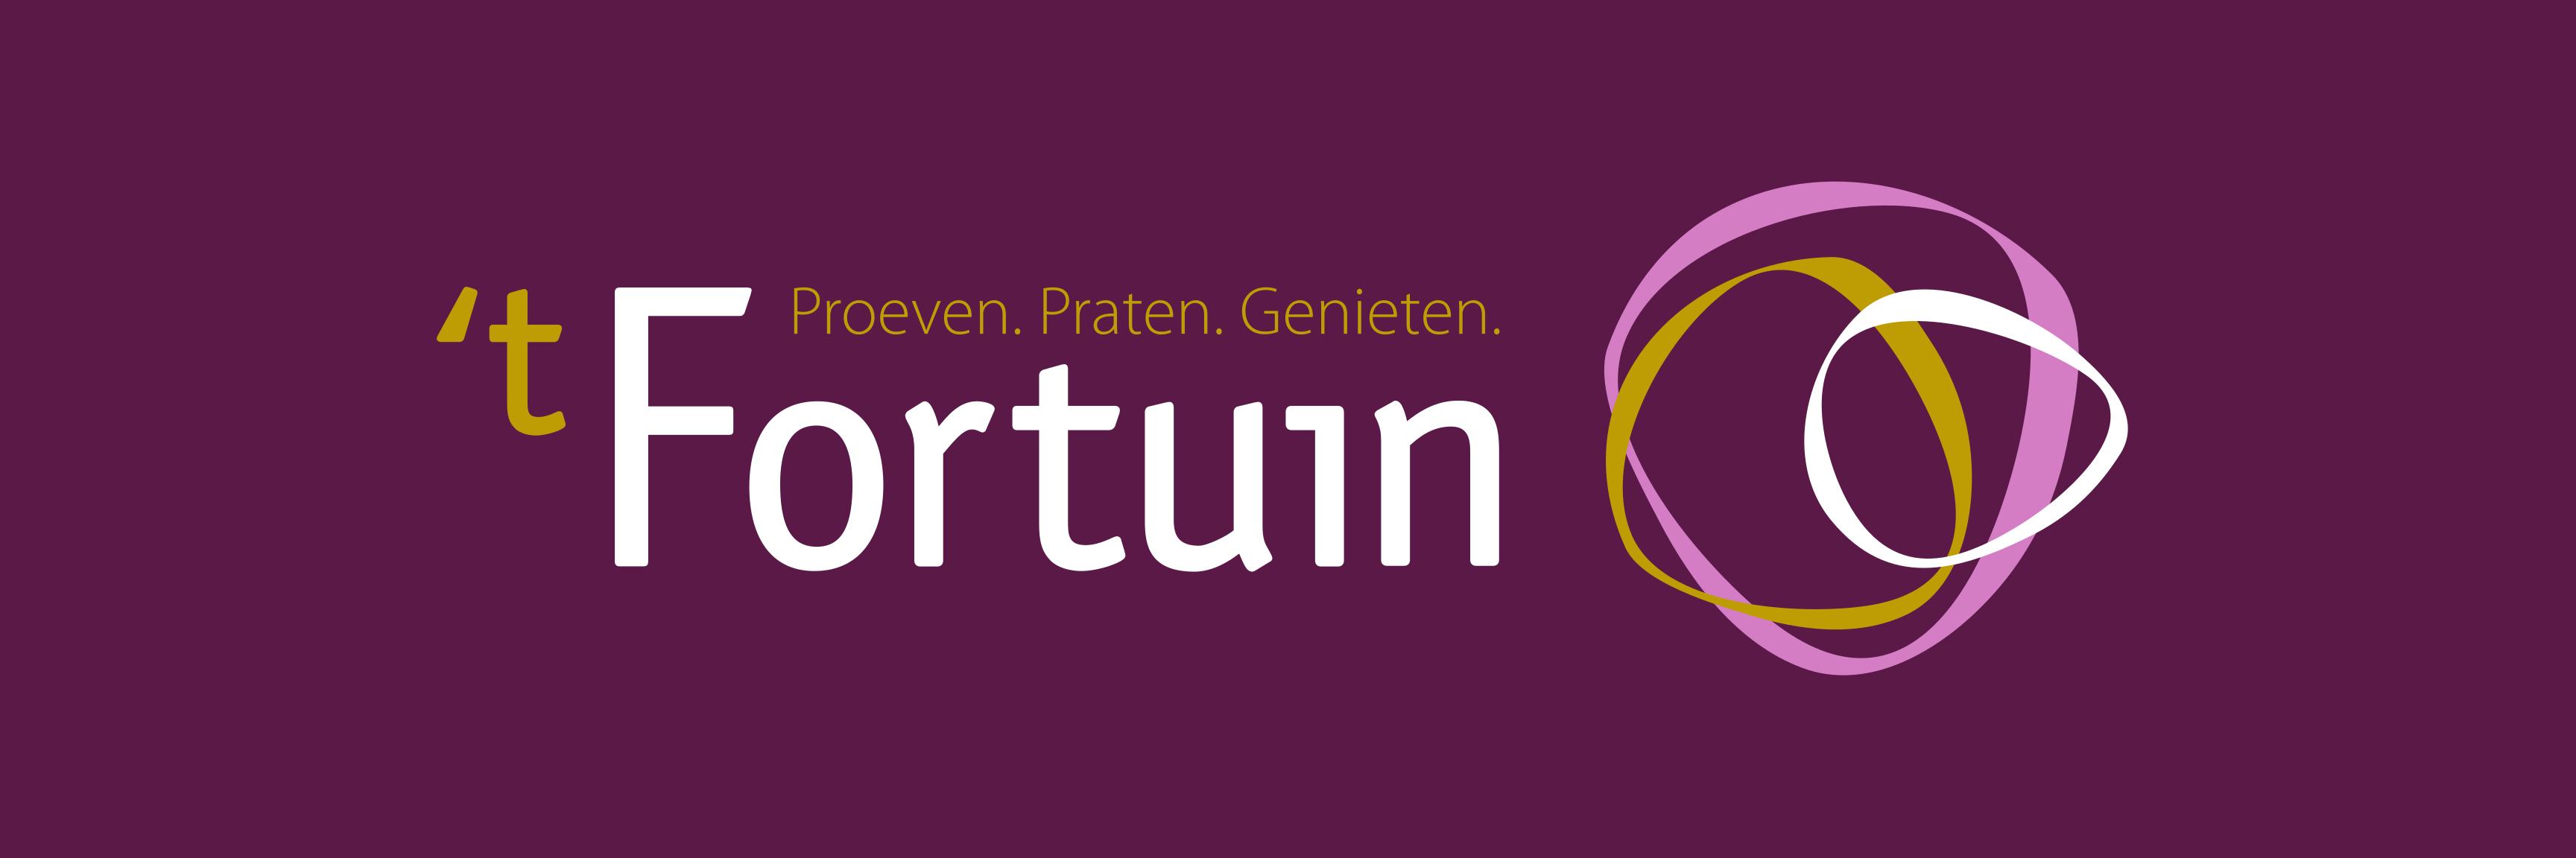 Café Restaurant 't Fortuin